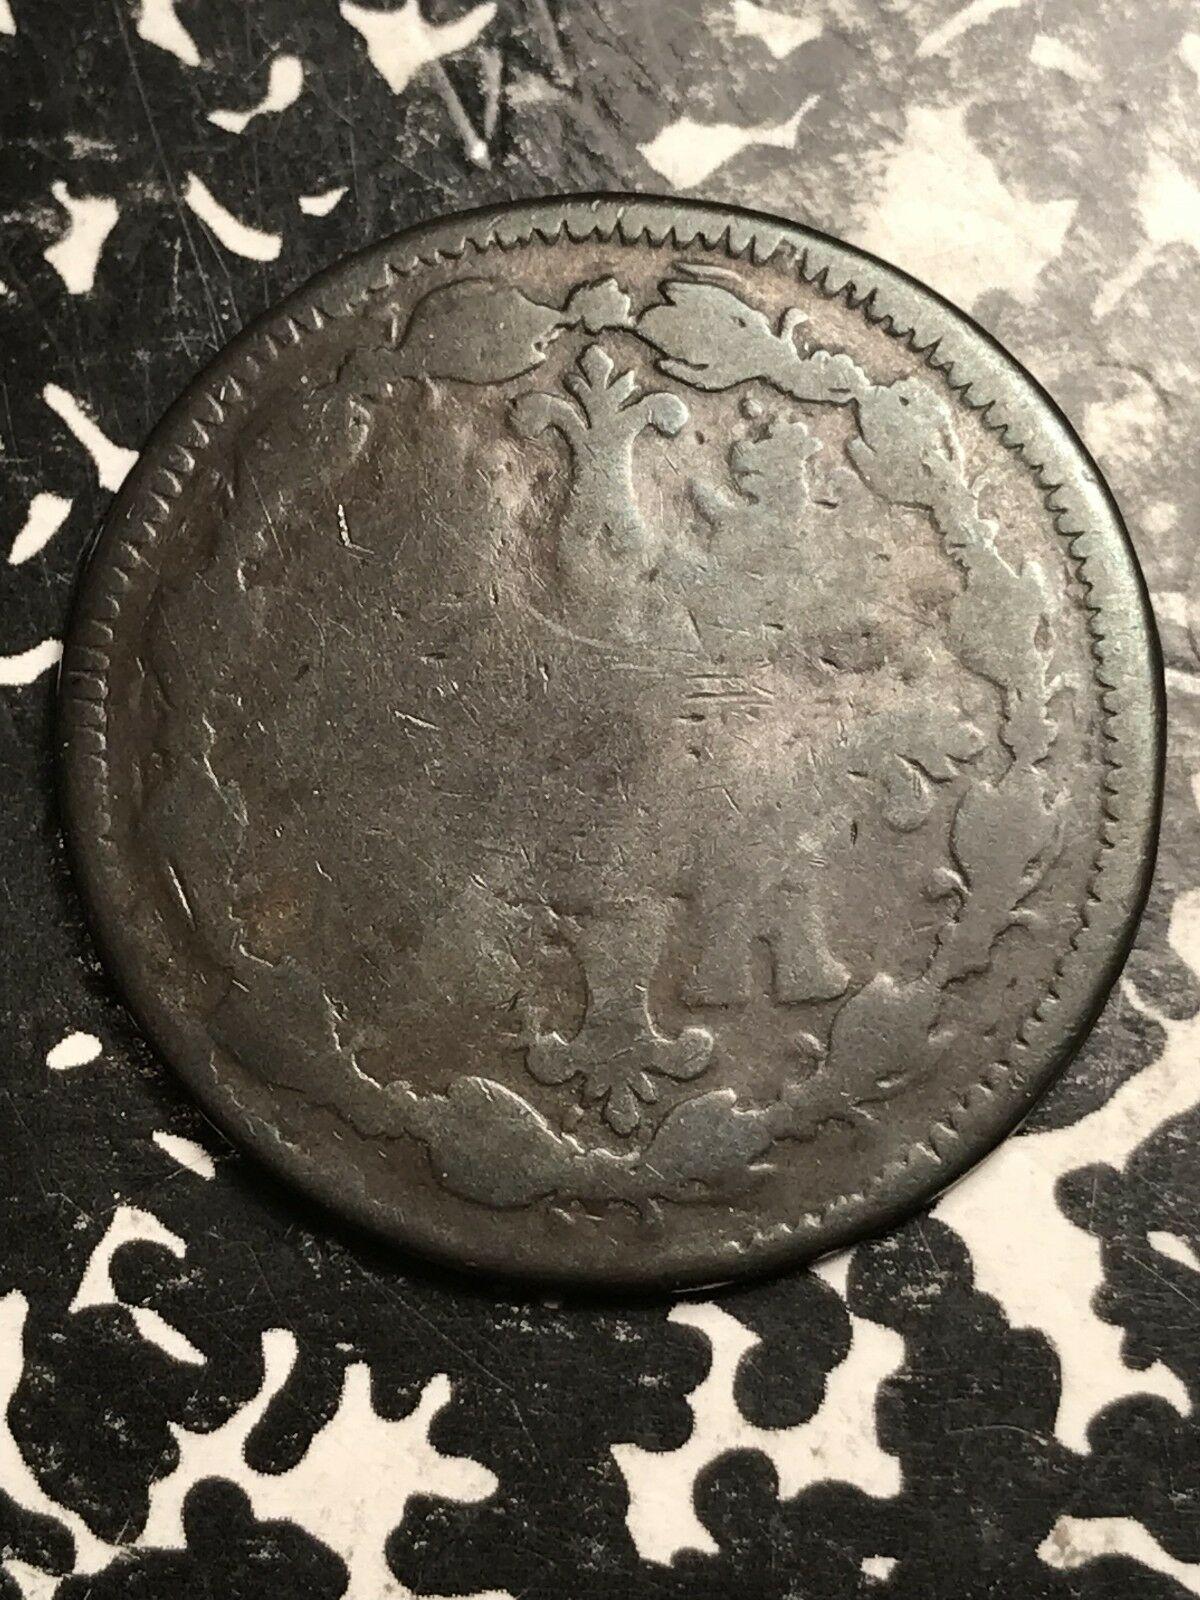 1820 Spagna 8 Marevedis Lotto #X5416